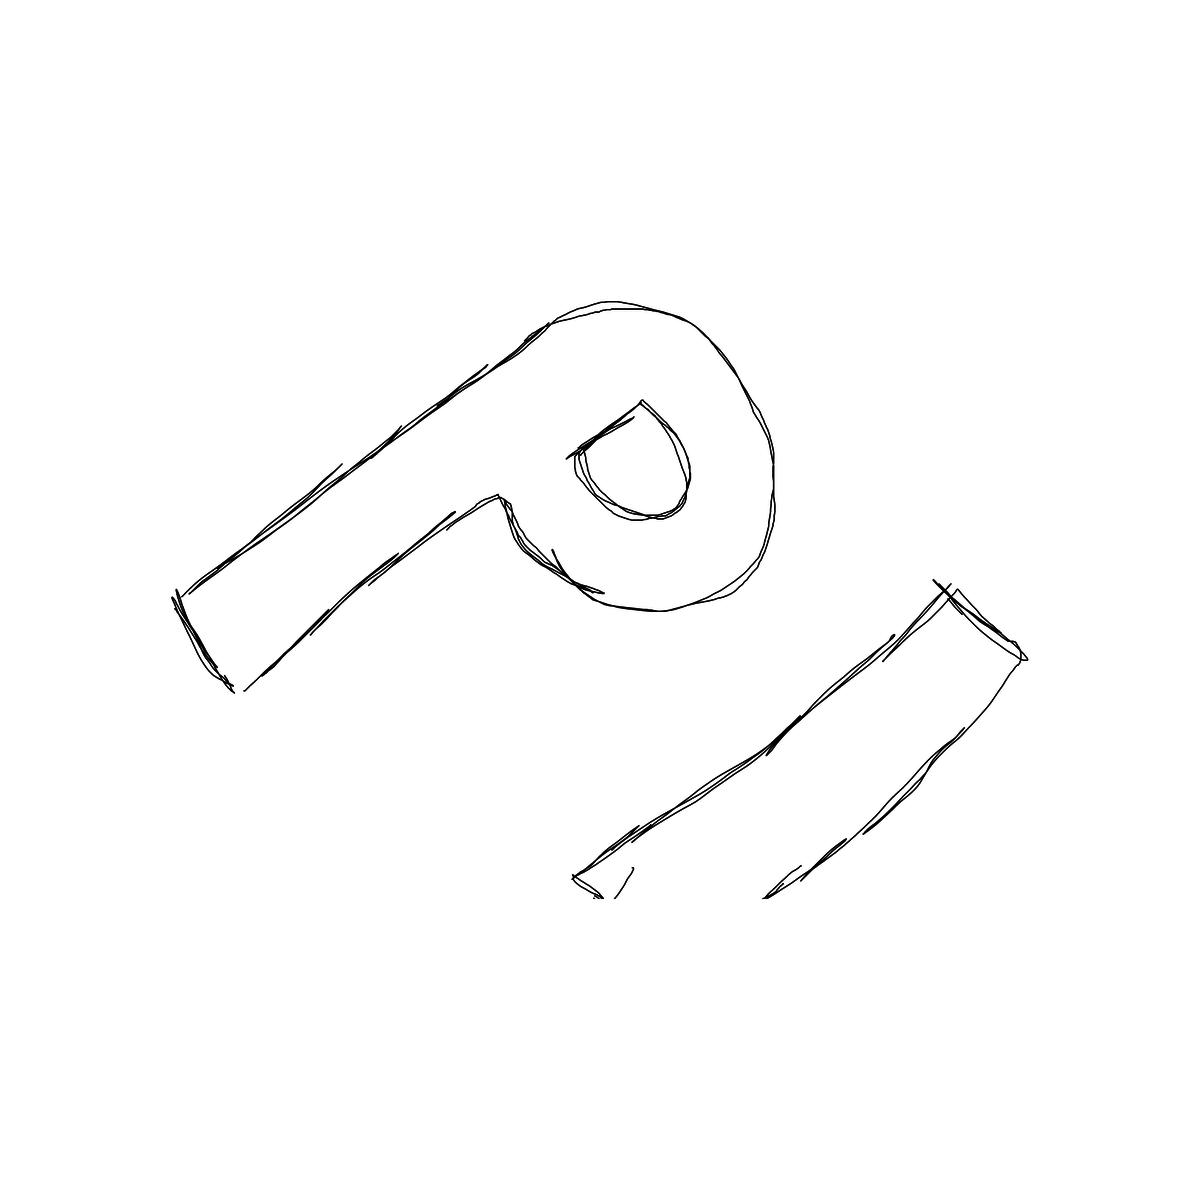 BAAAM drawing#18258 lat:-23.5657978057861330lng: -46.6513061523437500